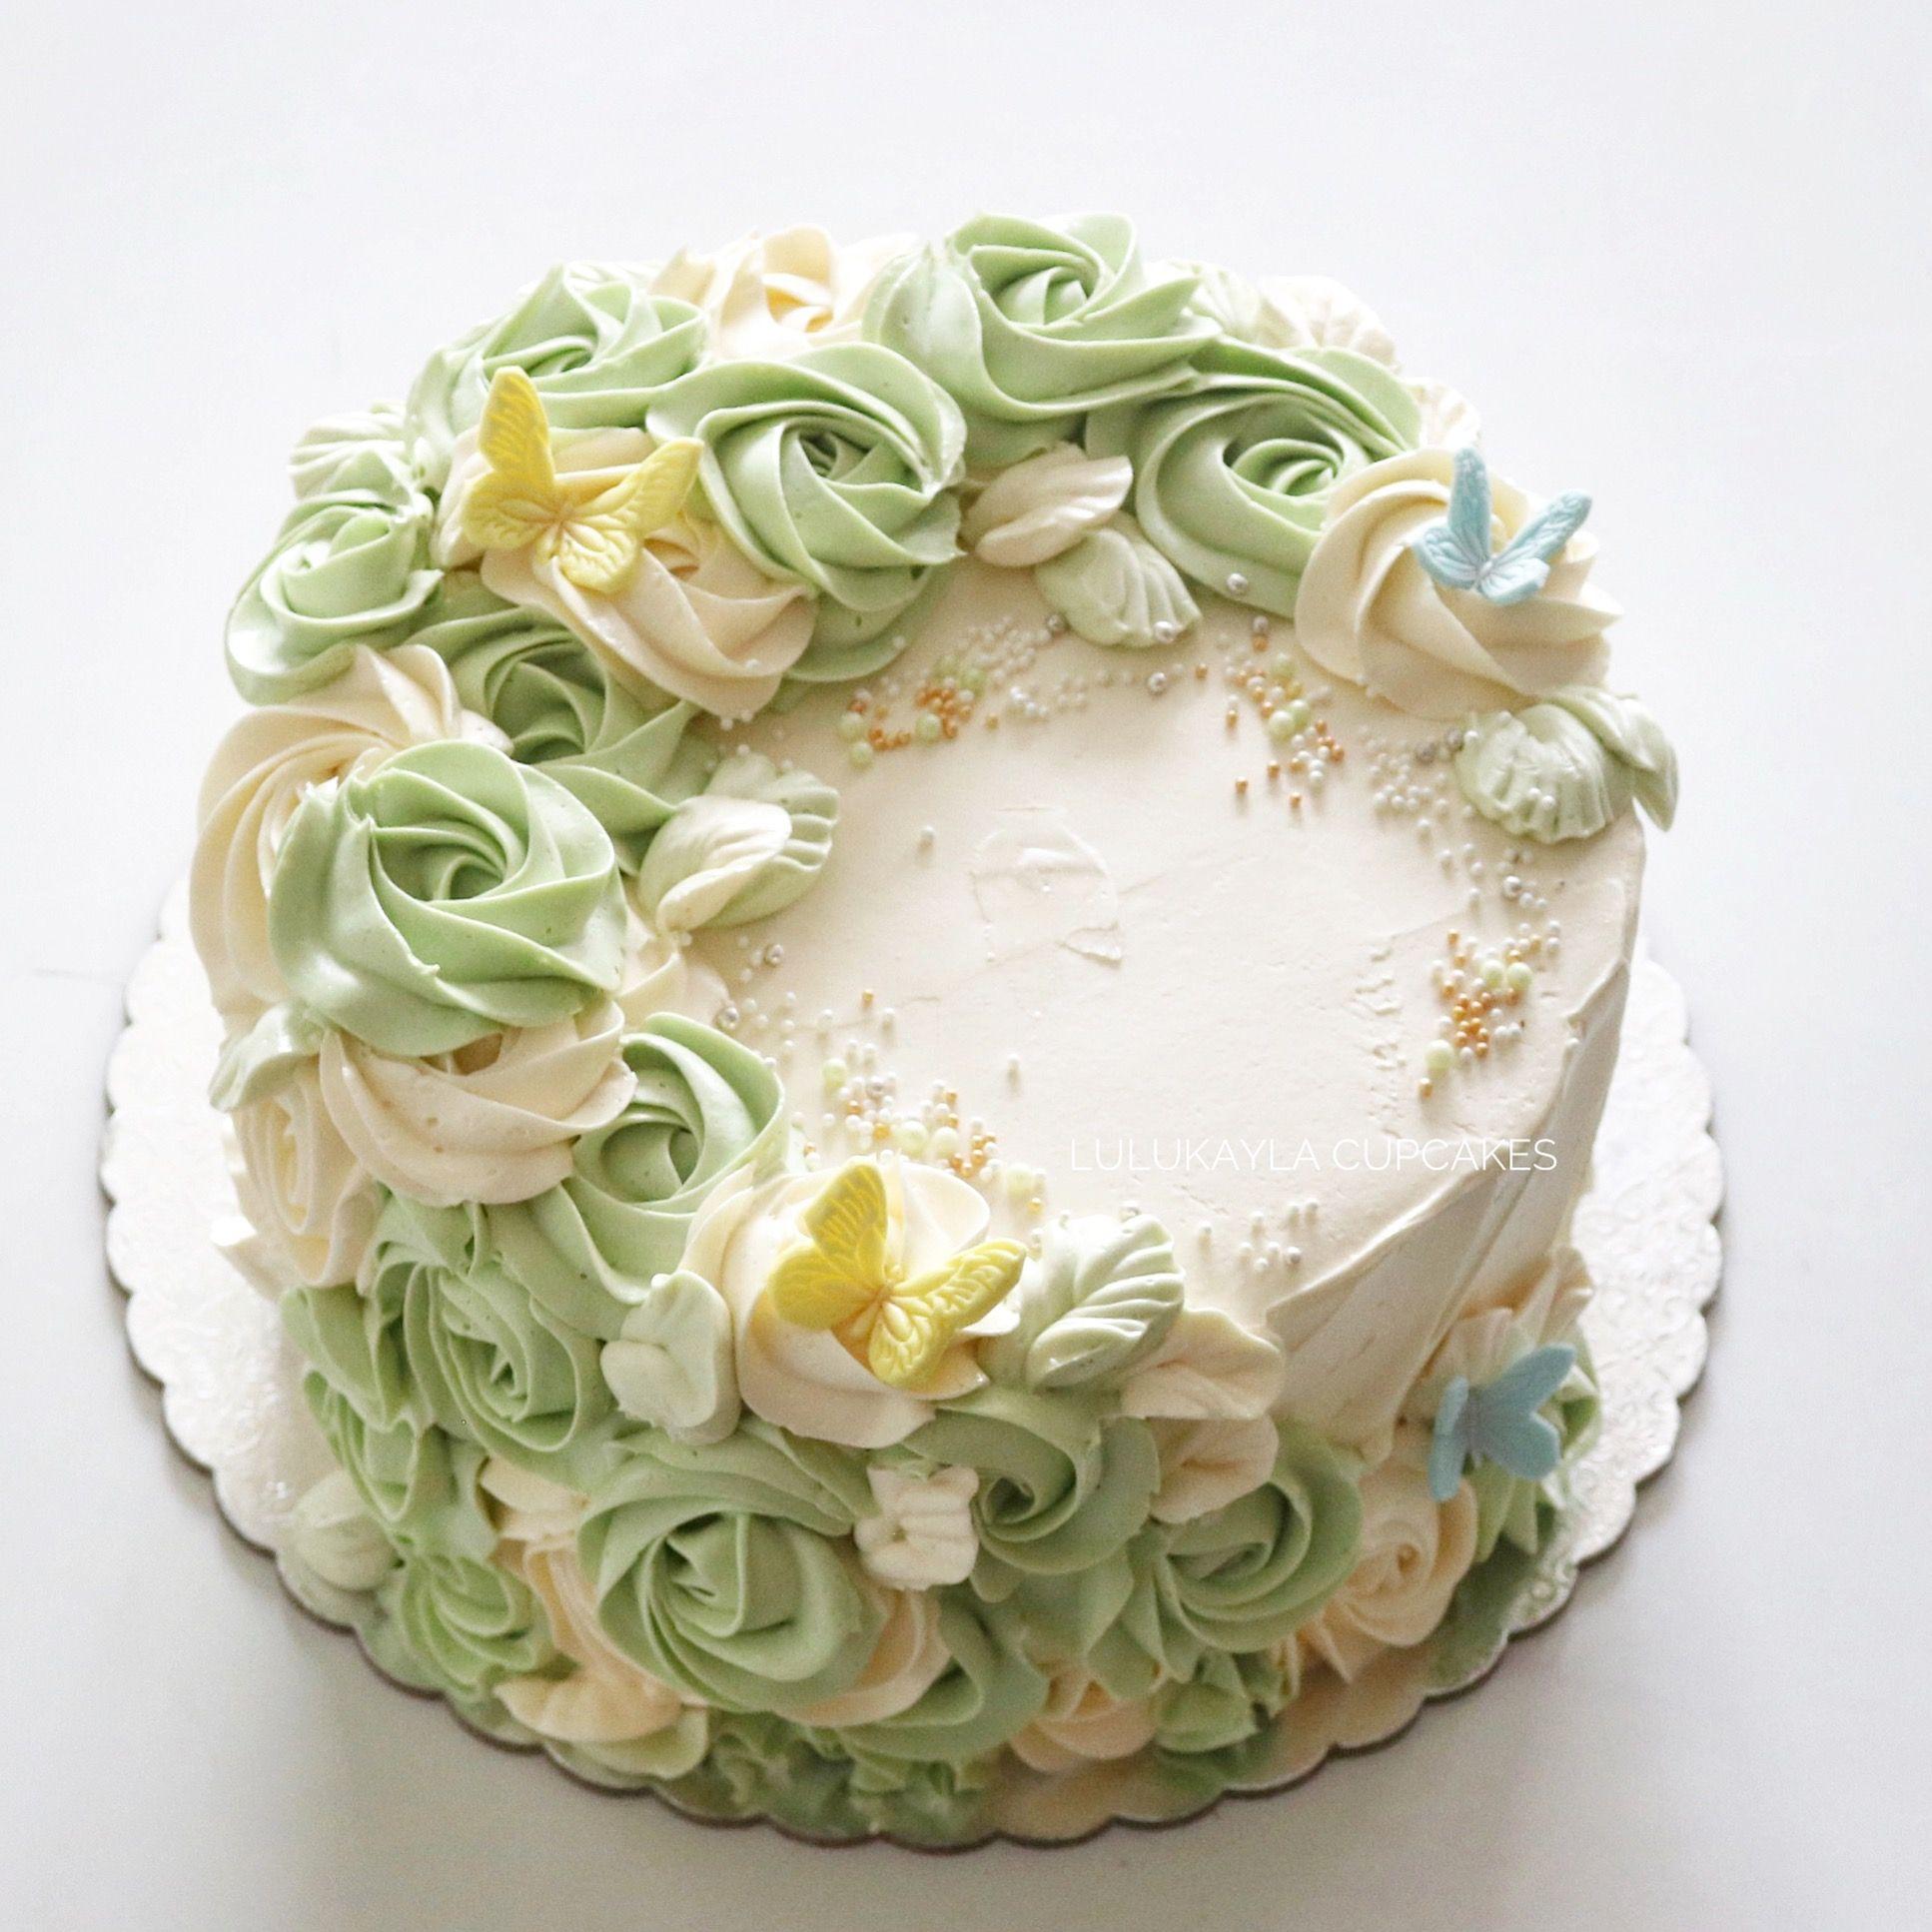 Rosette Buttercream Cake Cake Decorating Creative Cake Decorating Cake